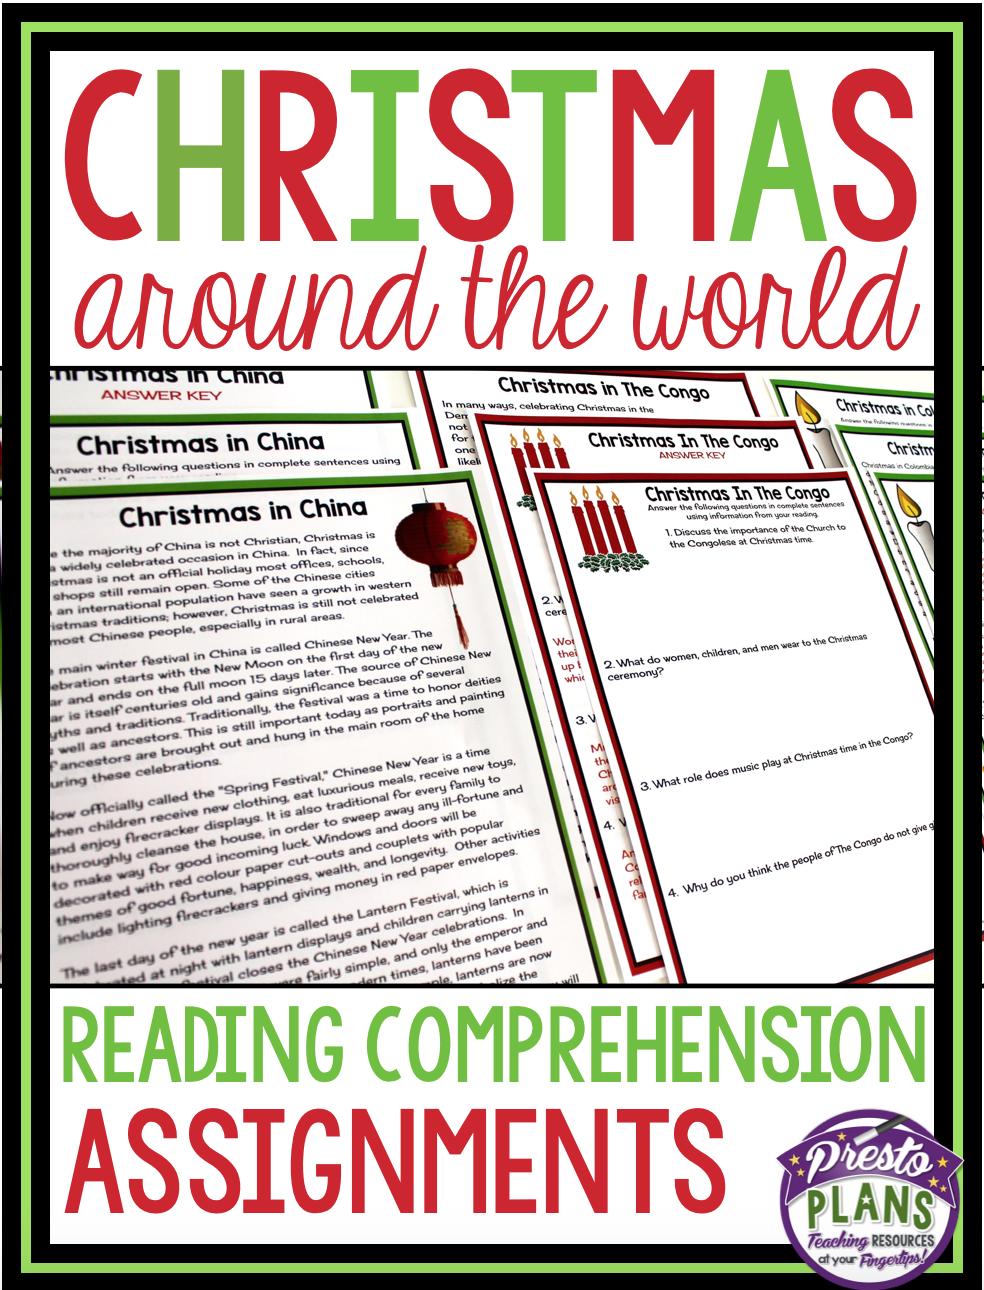 small resolution of CHRISTMAS AROUND THE WORLD READING COMPREHENSION   Reading comprehension